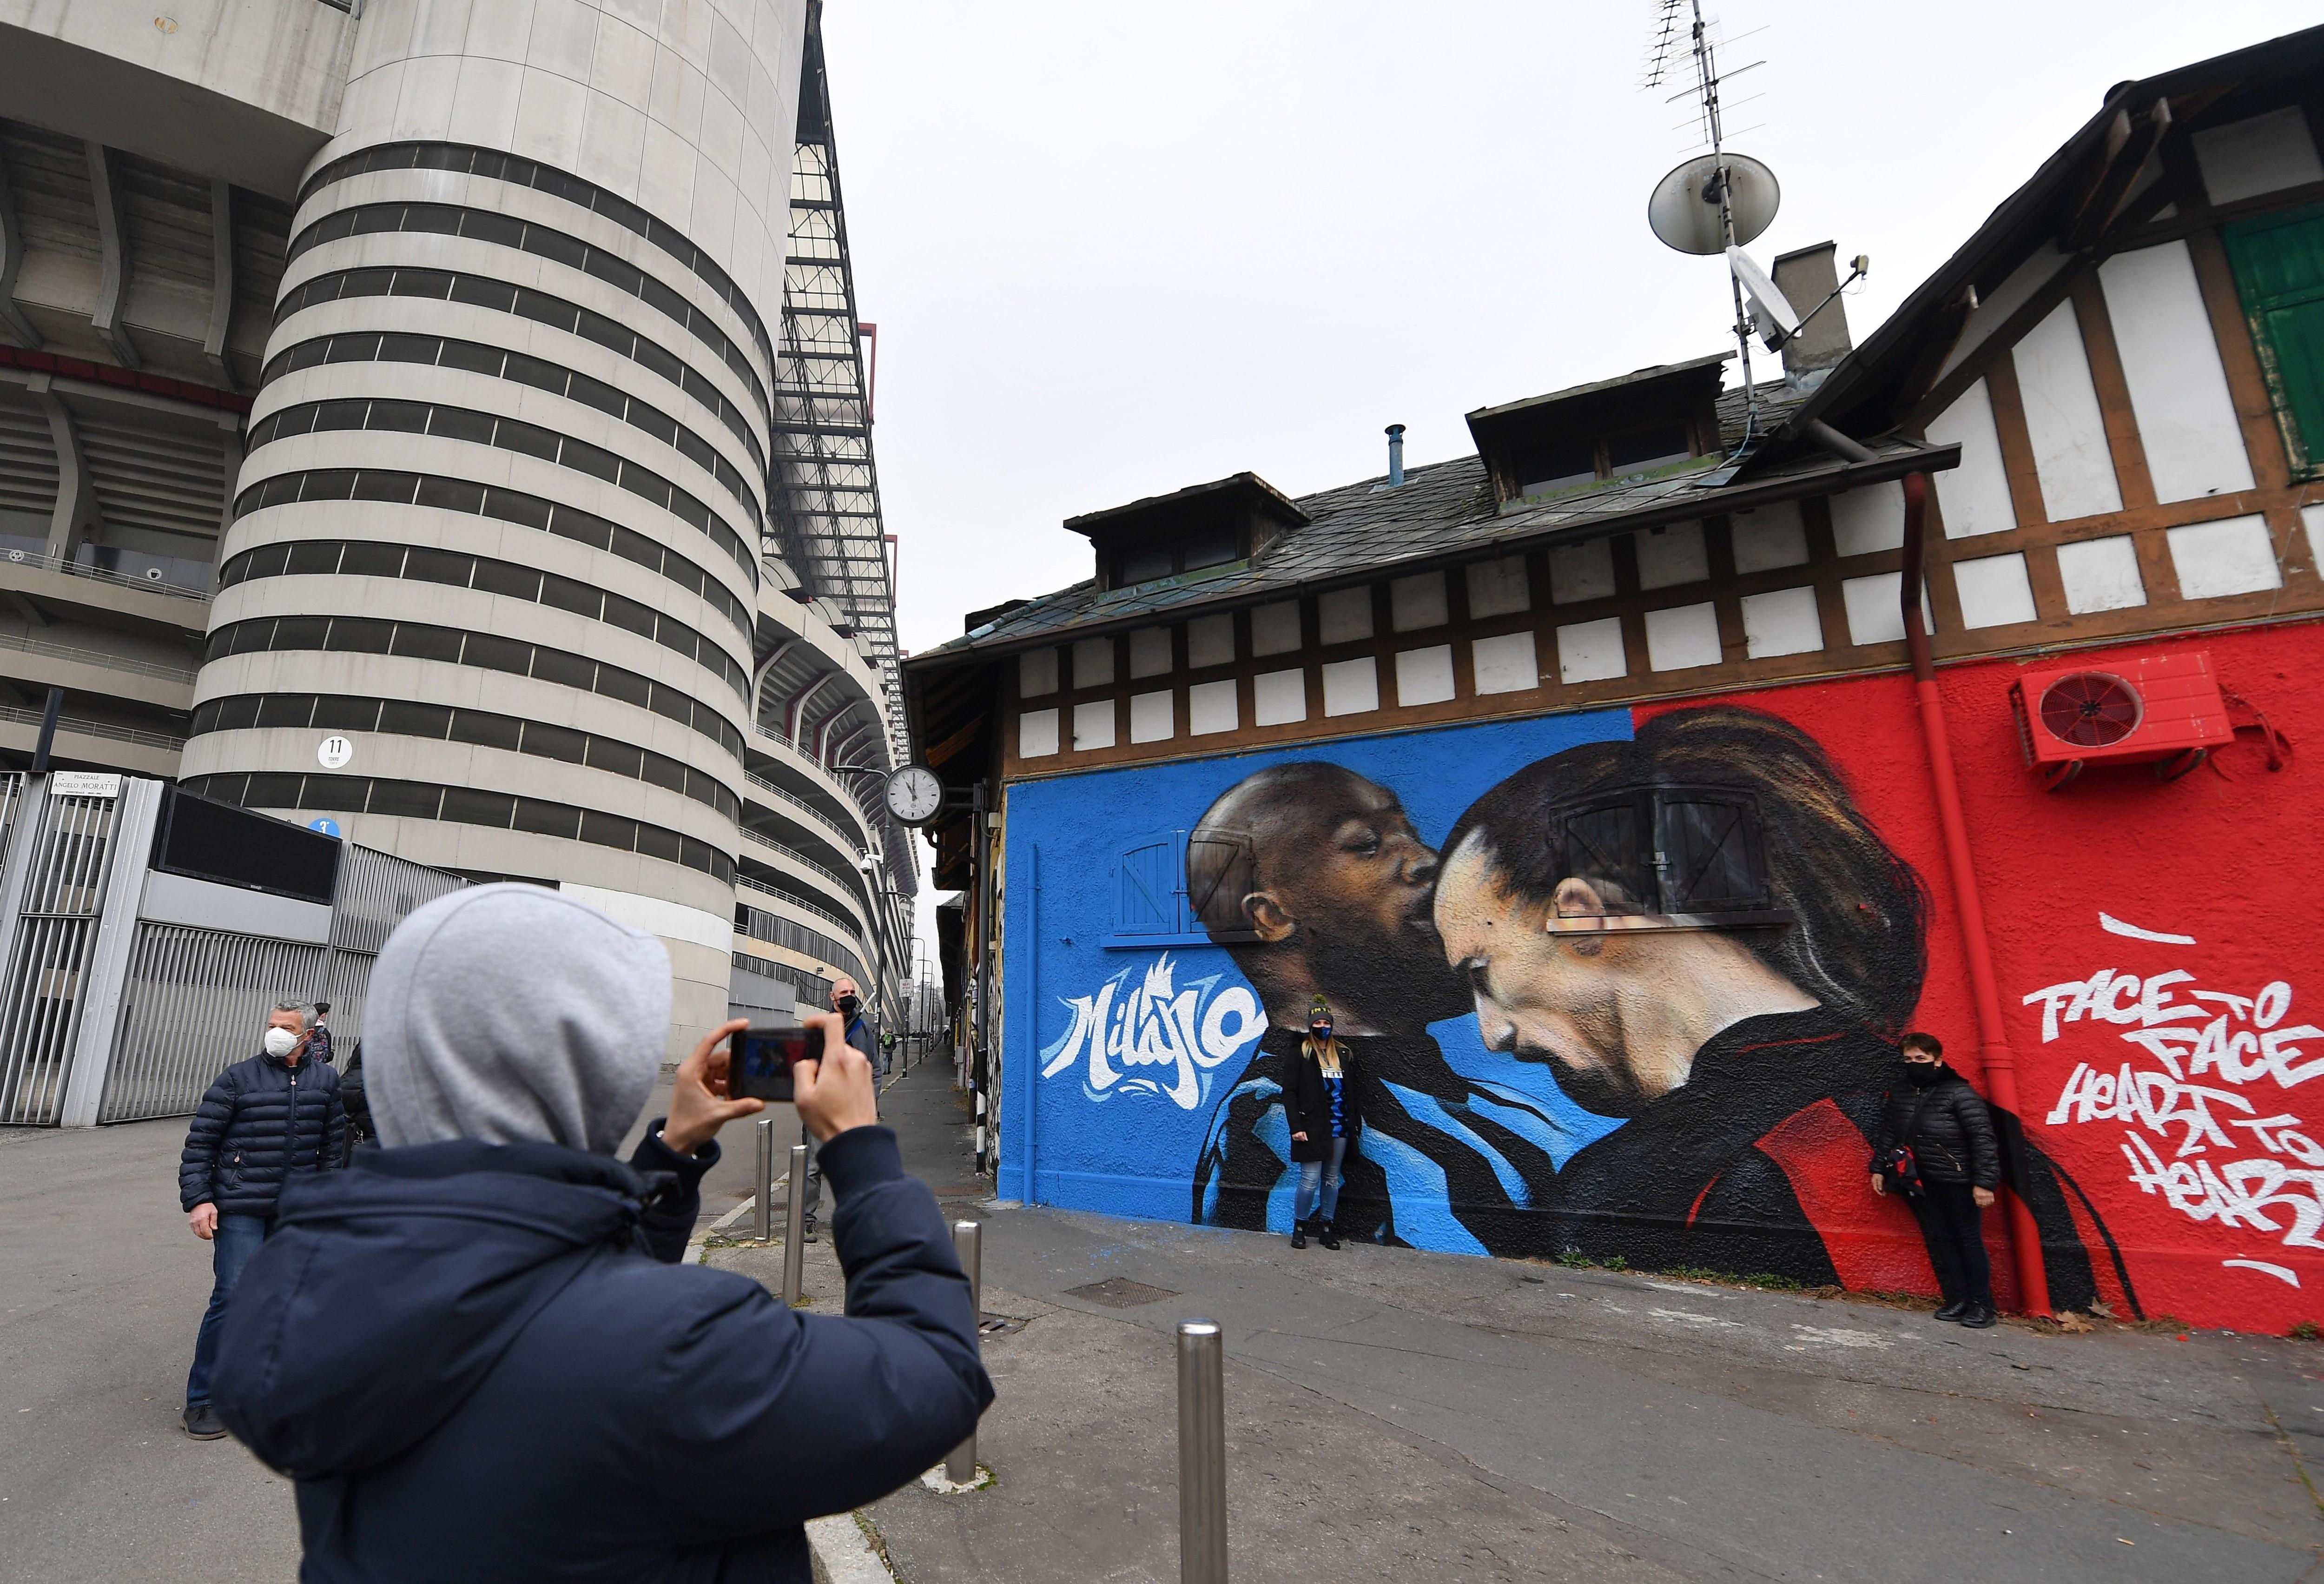 El encontronazo de Romelu Lukaku y Zlatan Ibrahimovic inmortalizado en un mural al ingreso del San Ciro. REUTERS/Daniele Mascolo